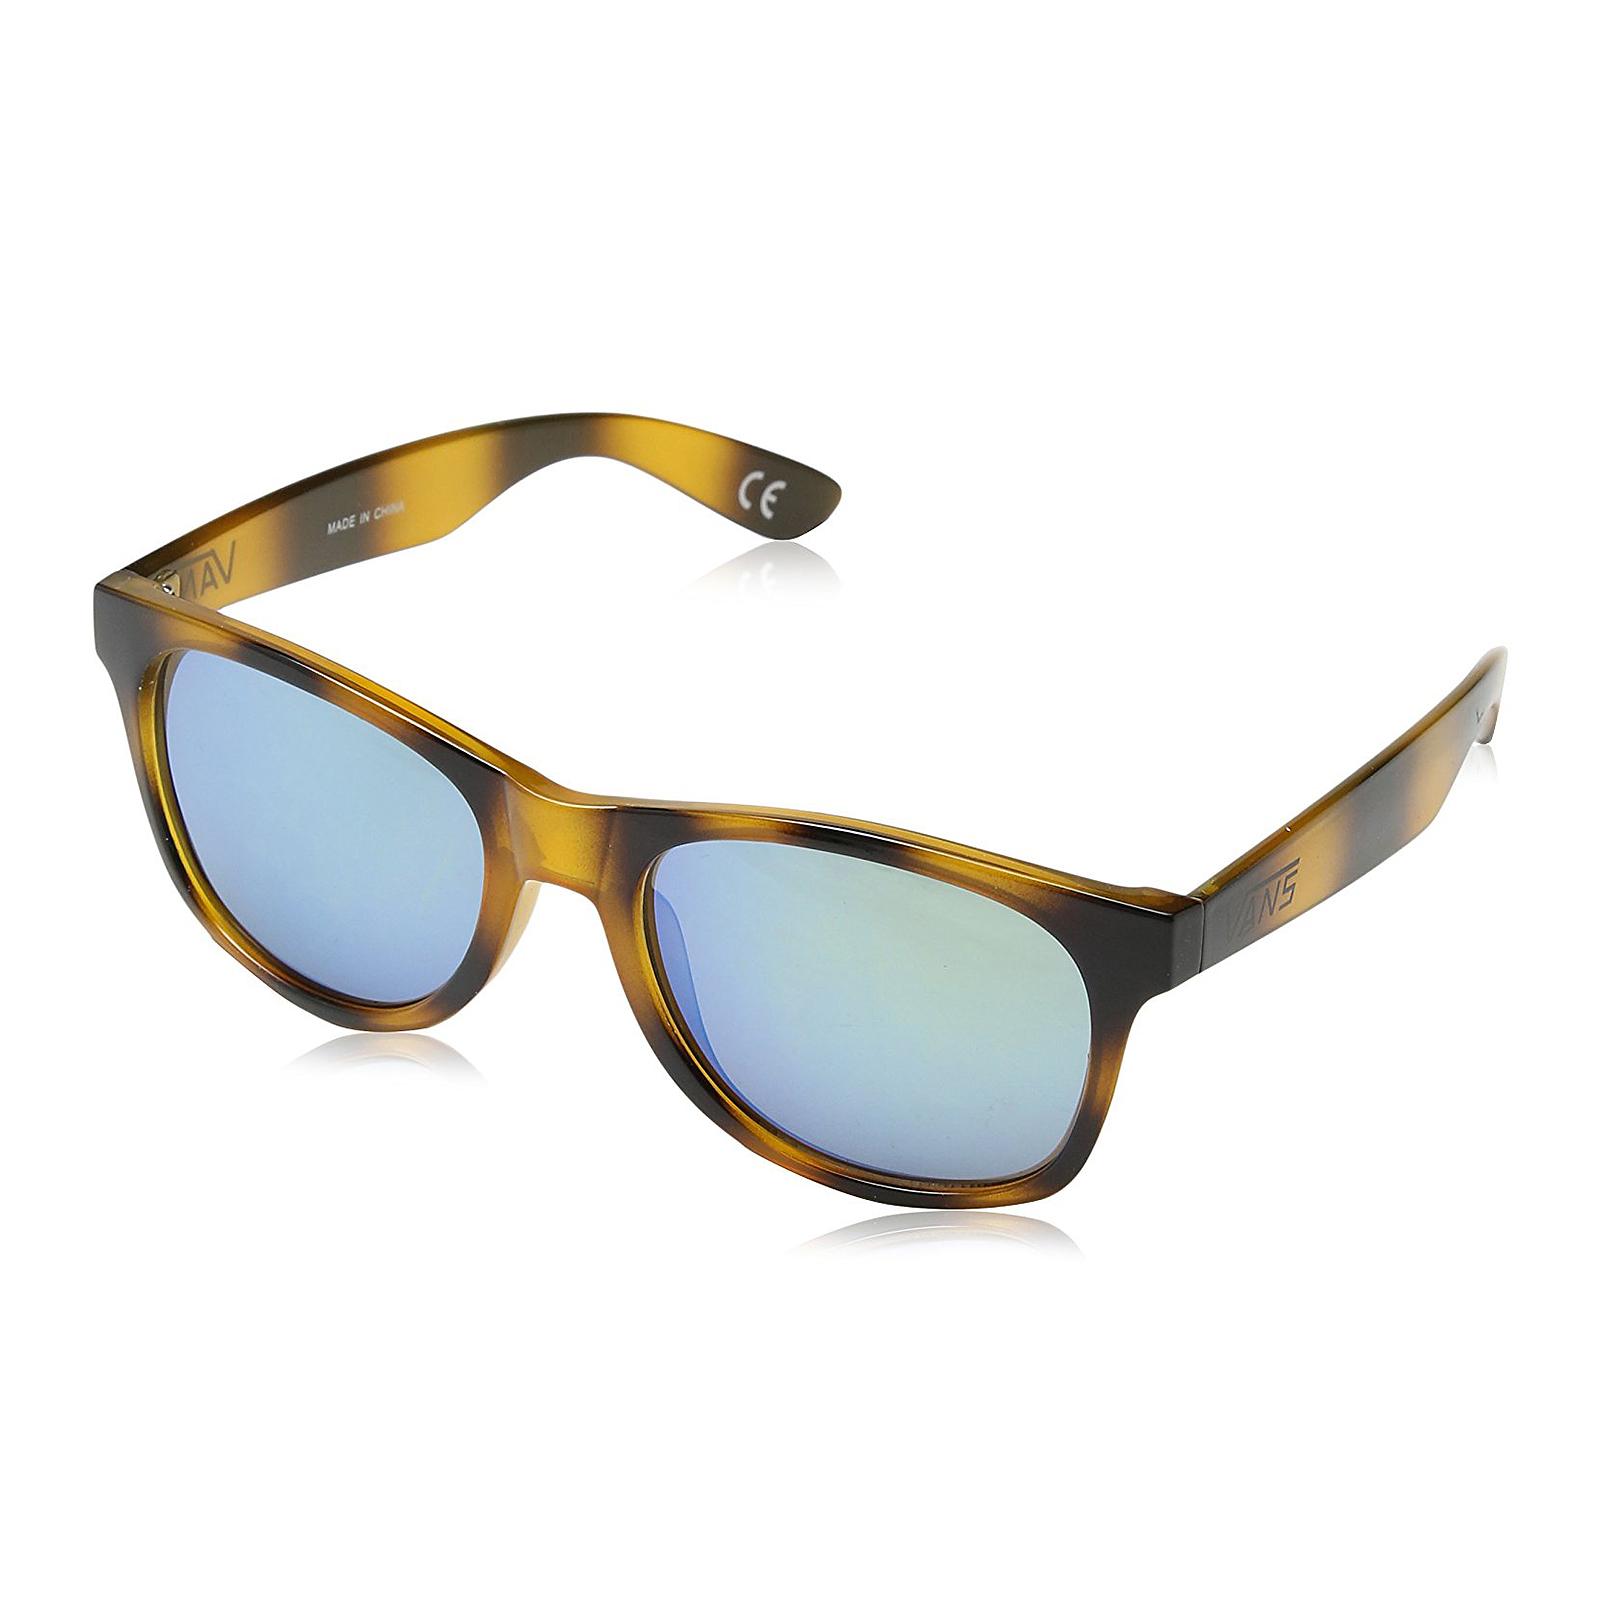 l'ultimo 40361 7af78 Details about Vans Sunglasses MN Spicoli 4 Shades Brown Tortoise Brown-  show original title